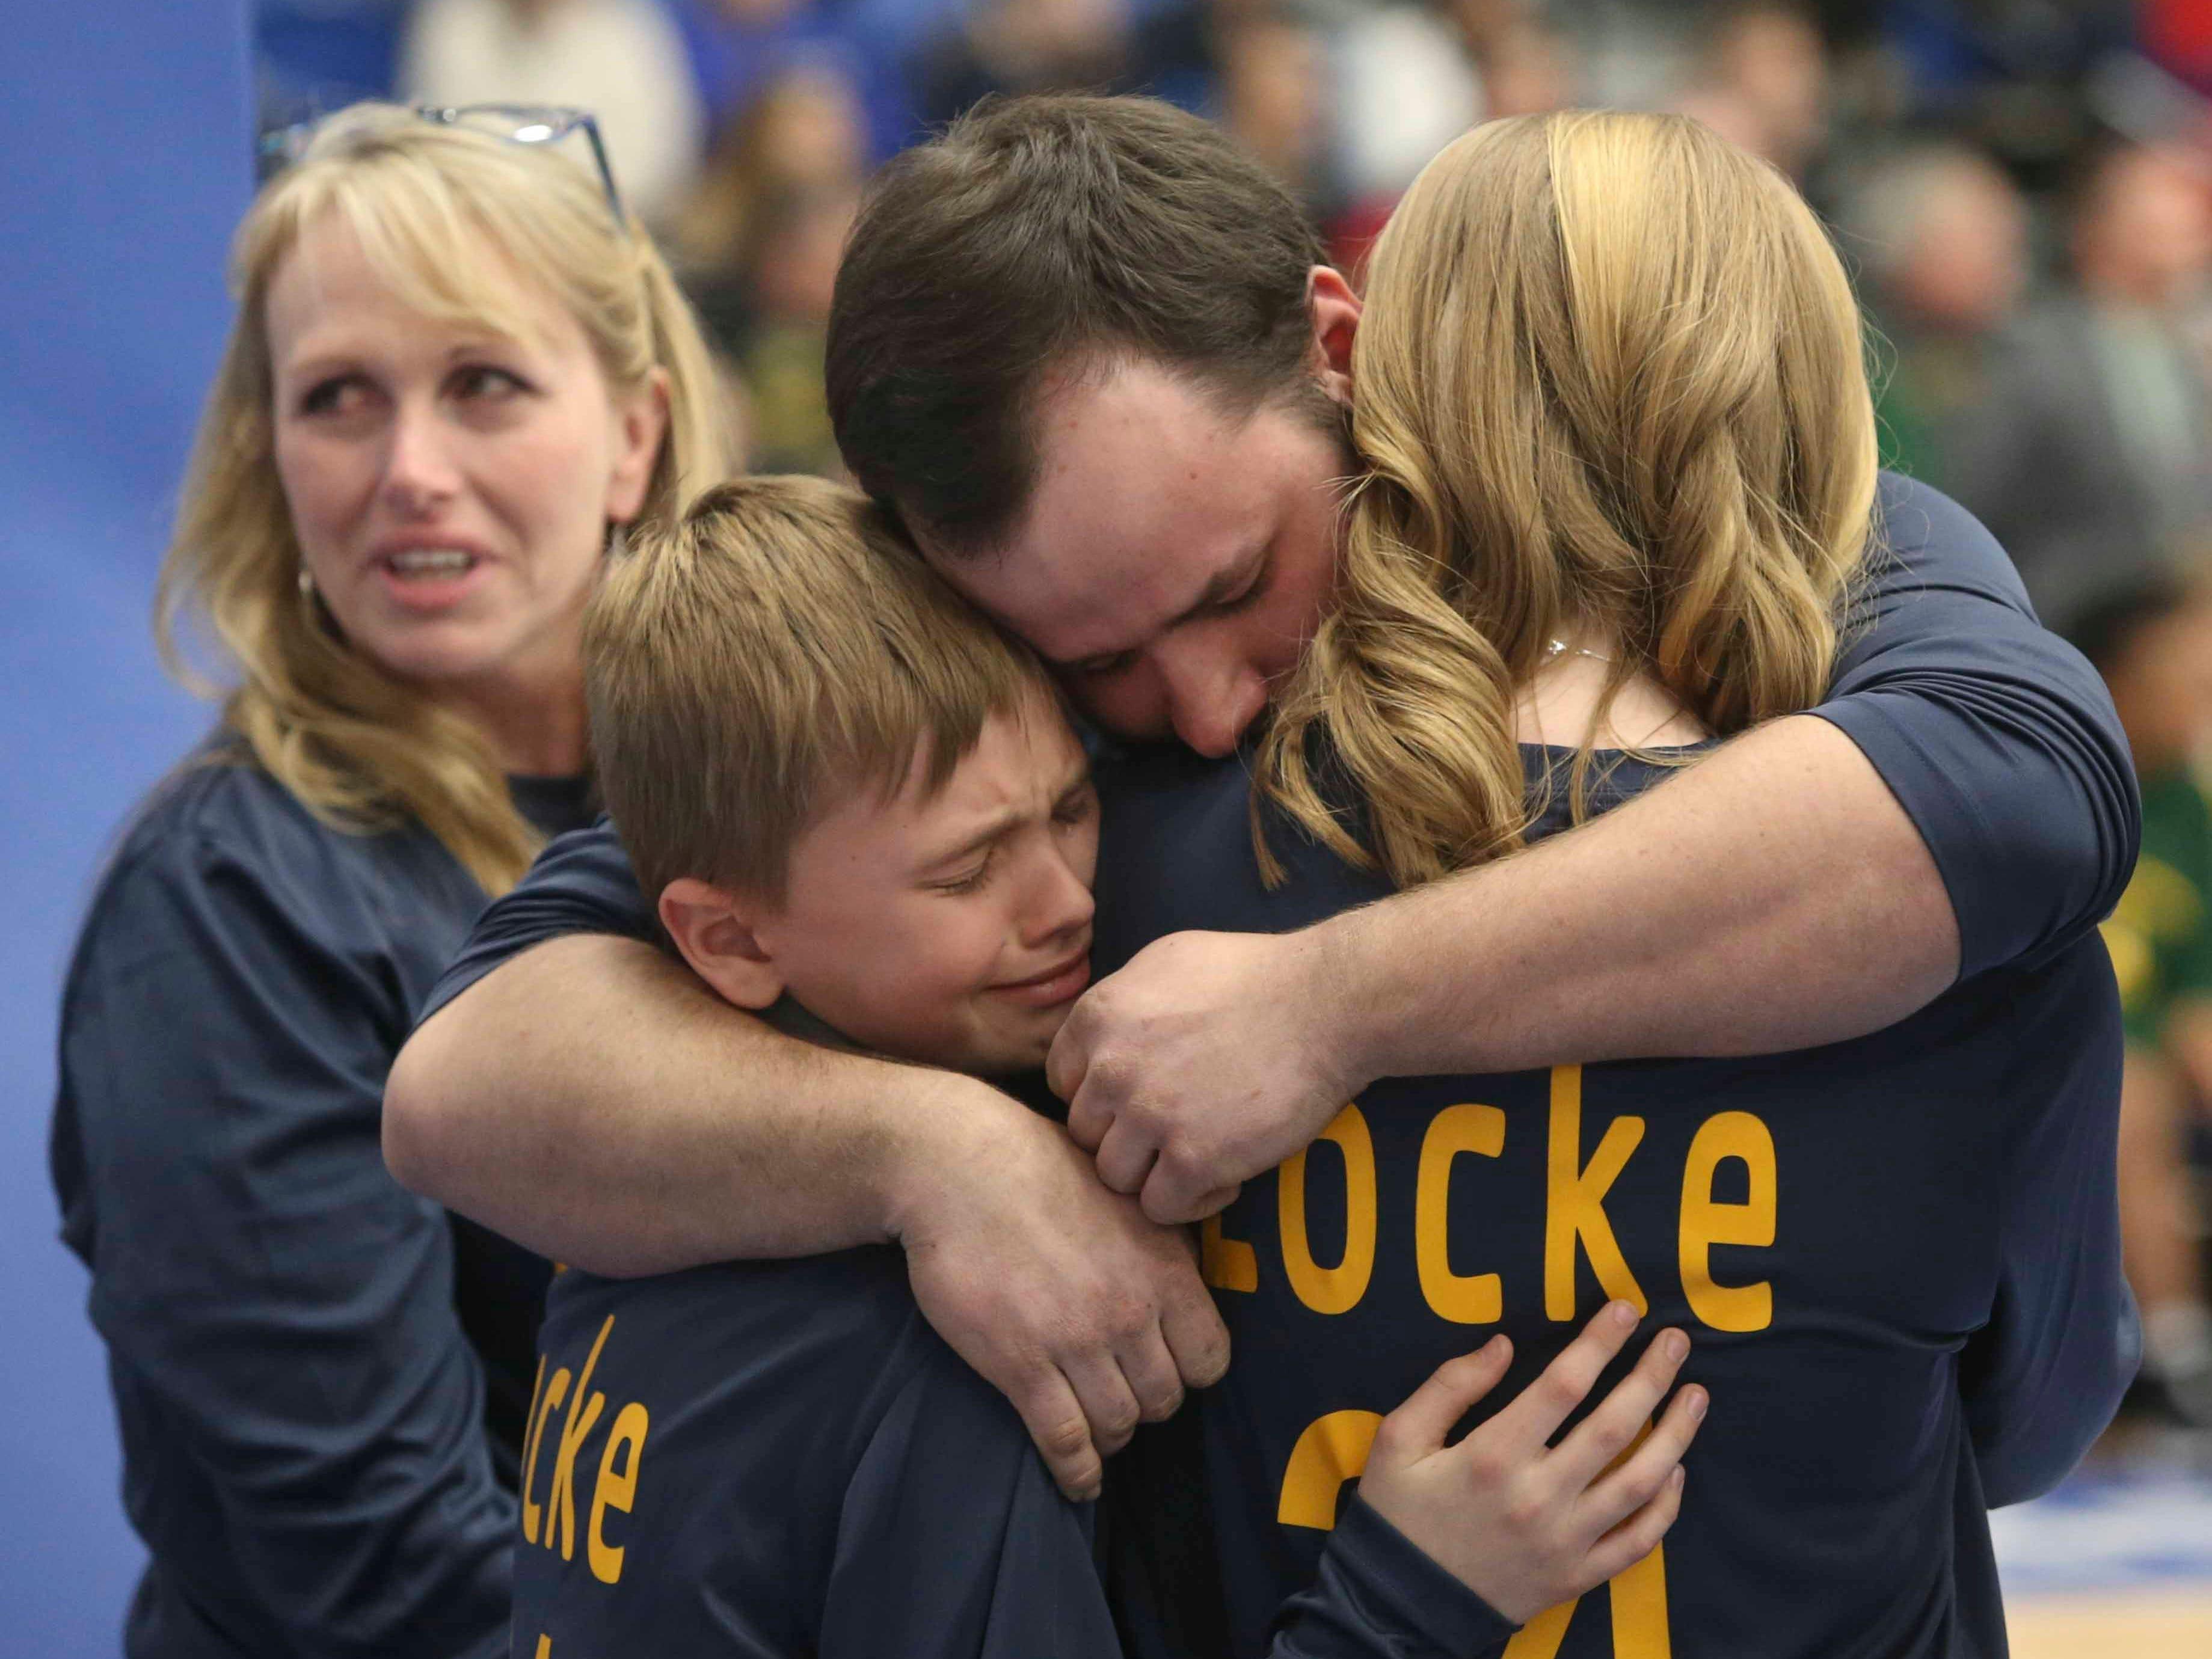 Siblings of Sean Locke hug during ceremonies between games in the SL24 Memorial Basketball Classic at the 76ers Fieldhouse in Wilmington Friday.